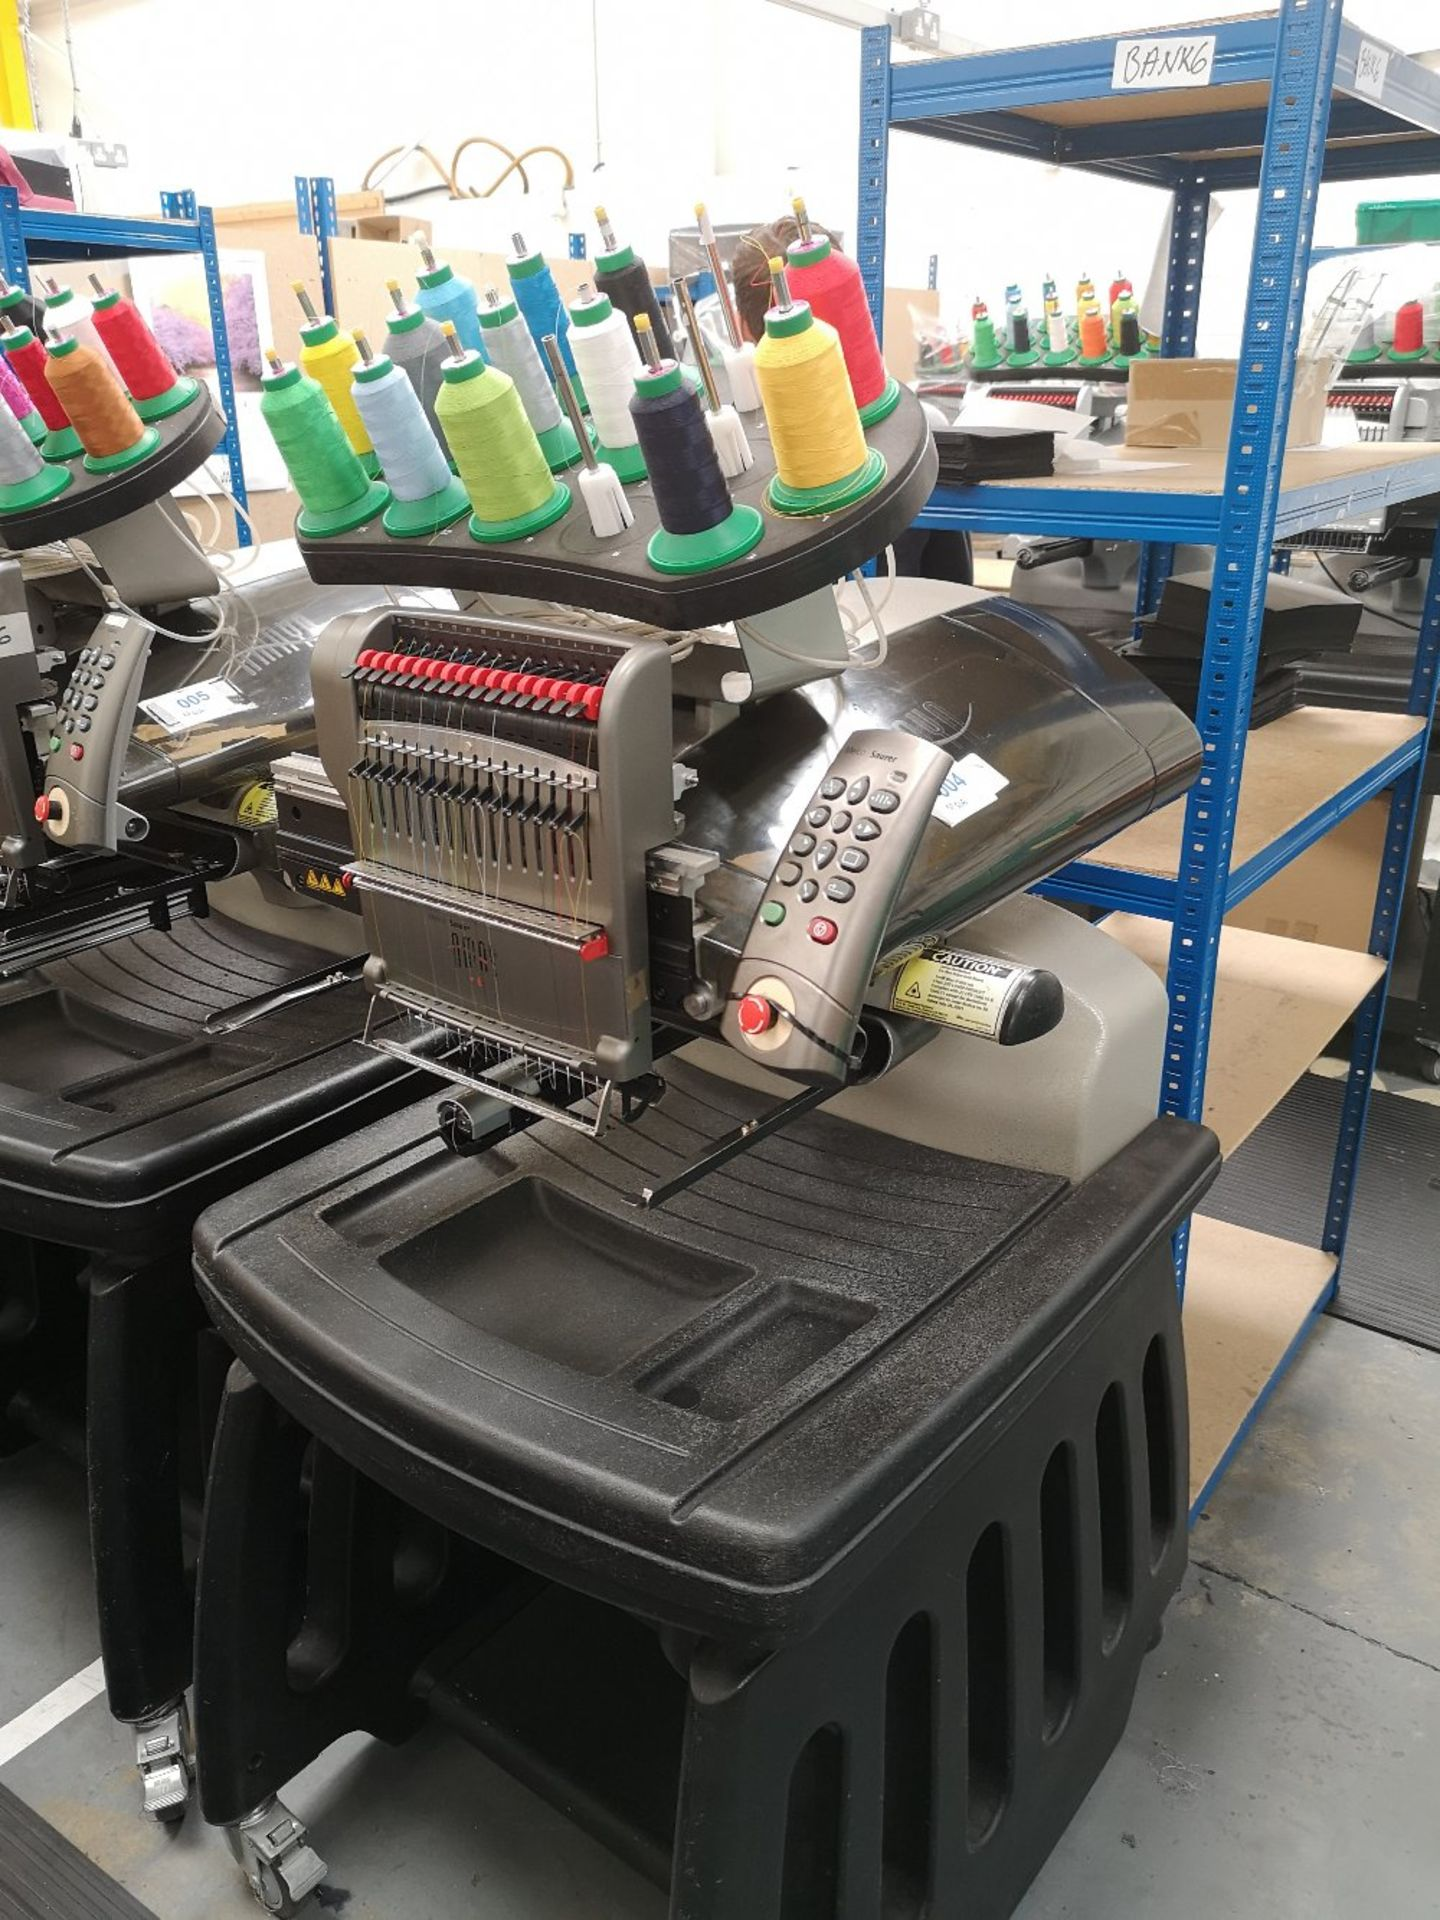 MELCO Amaya Embroidery Machine XT PN 3000007 - Image 2 of 4